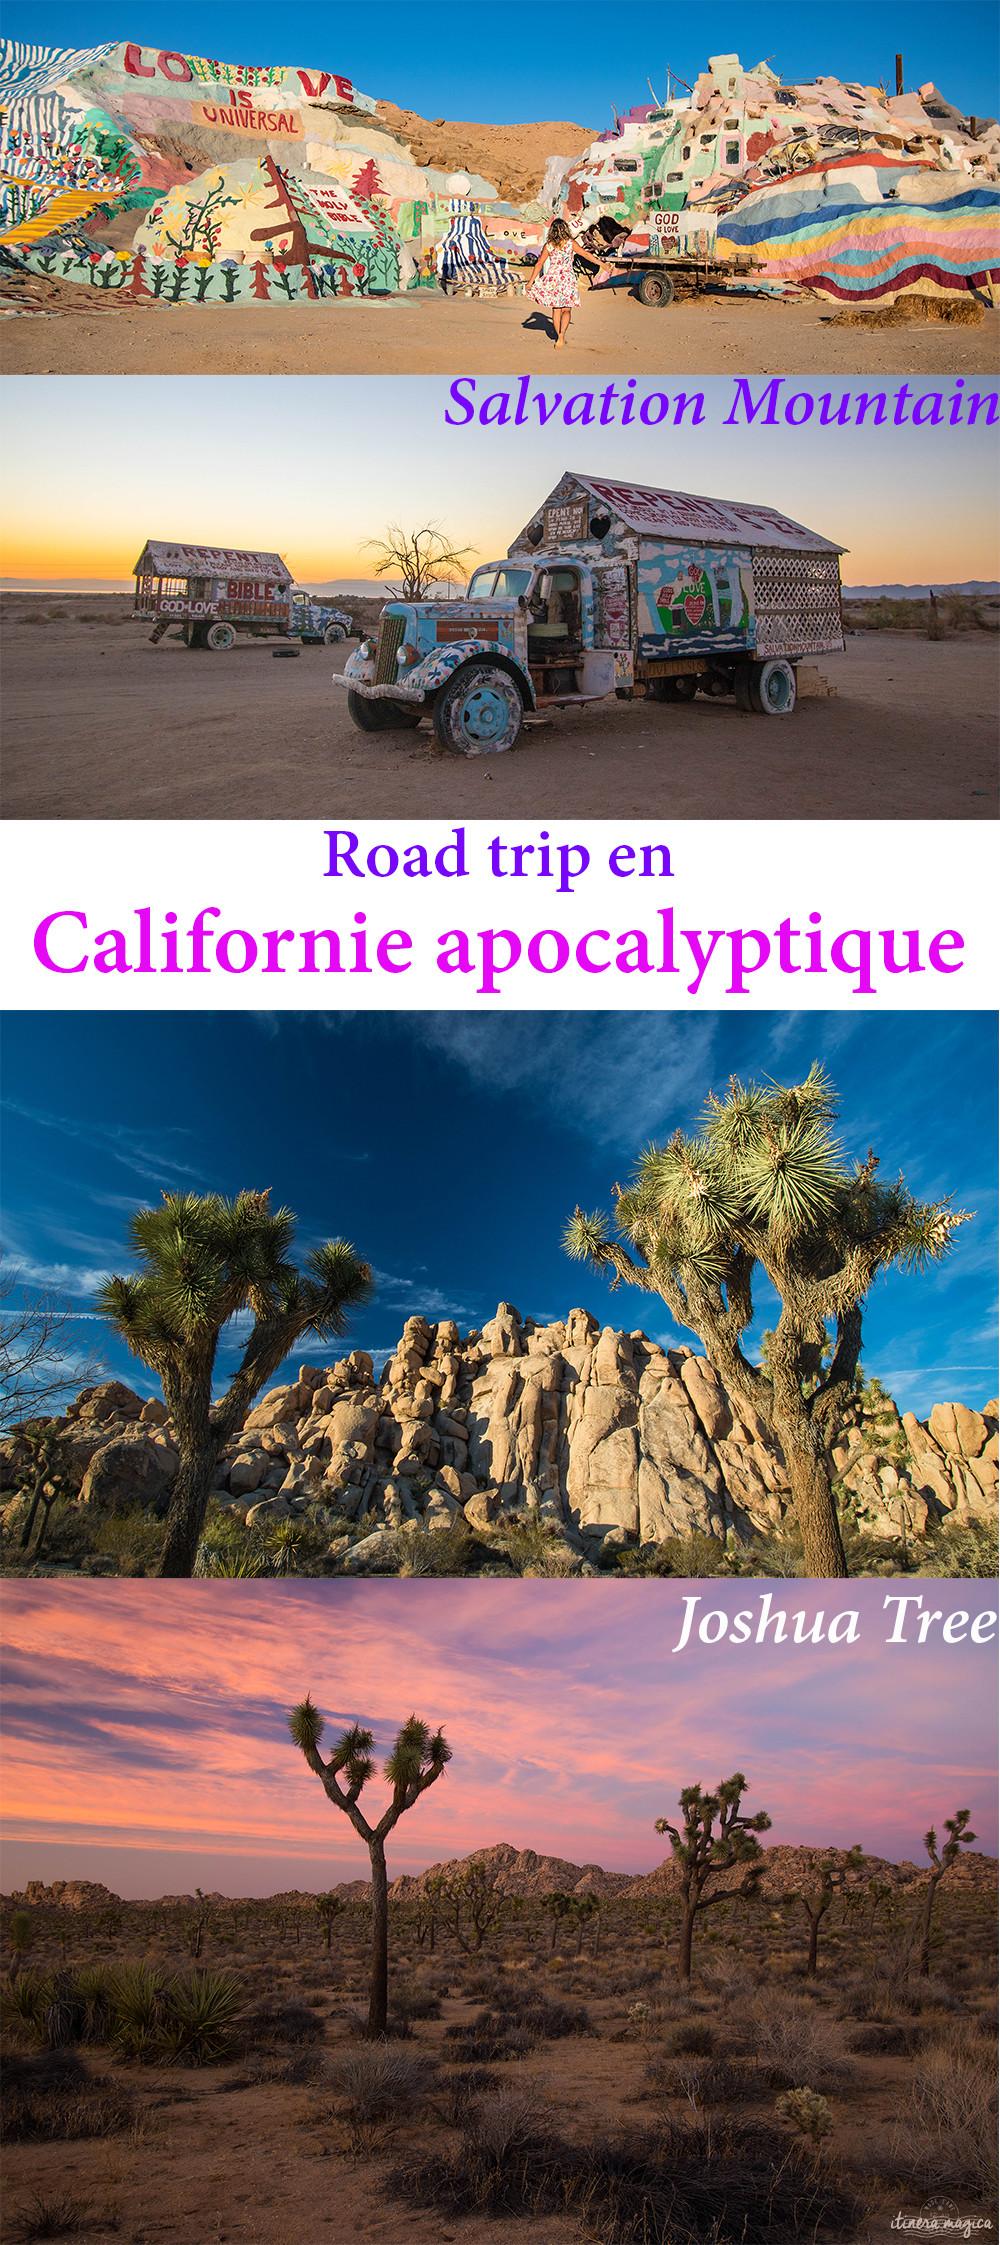 Salvation Mountain, Salton Sea, Joshua Tree : road trip en Californie apocalyptique. #californie #salvationmountain #usa #saltonsea #joshuatree